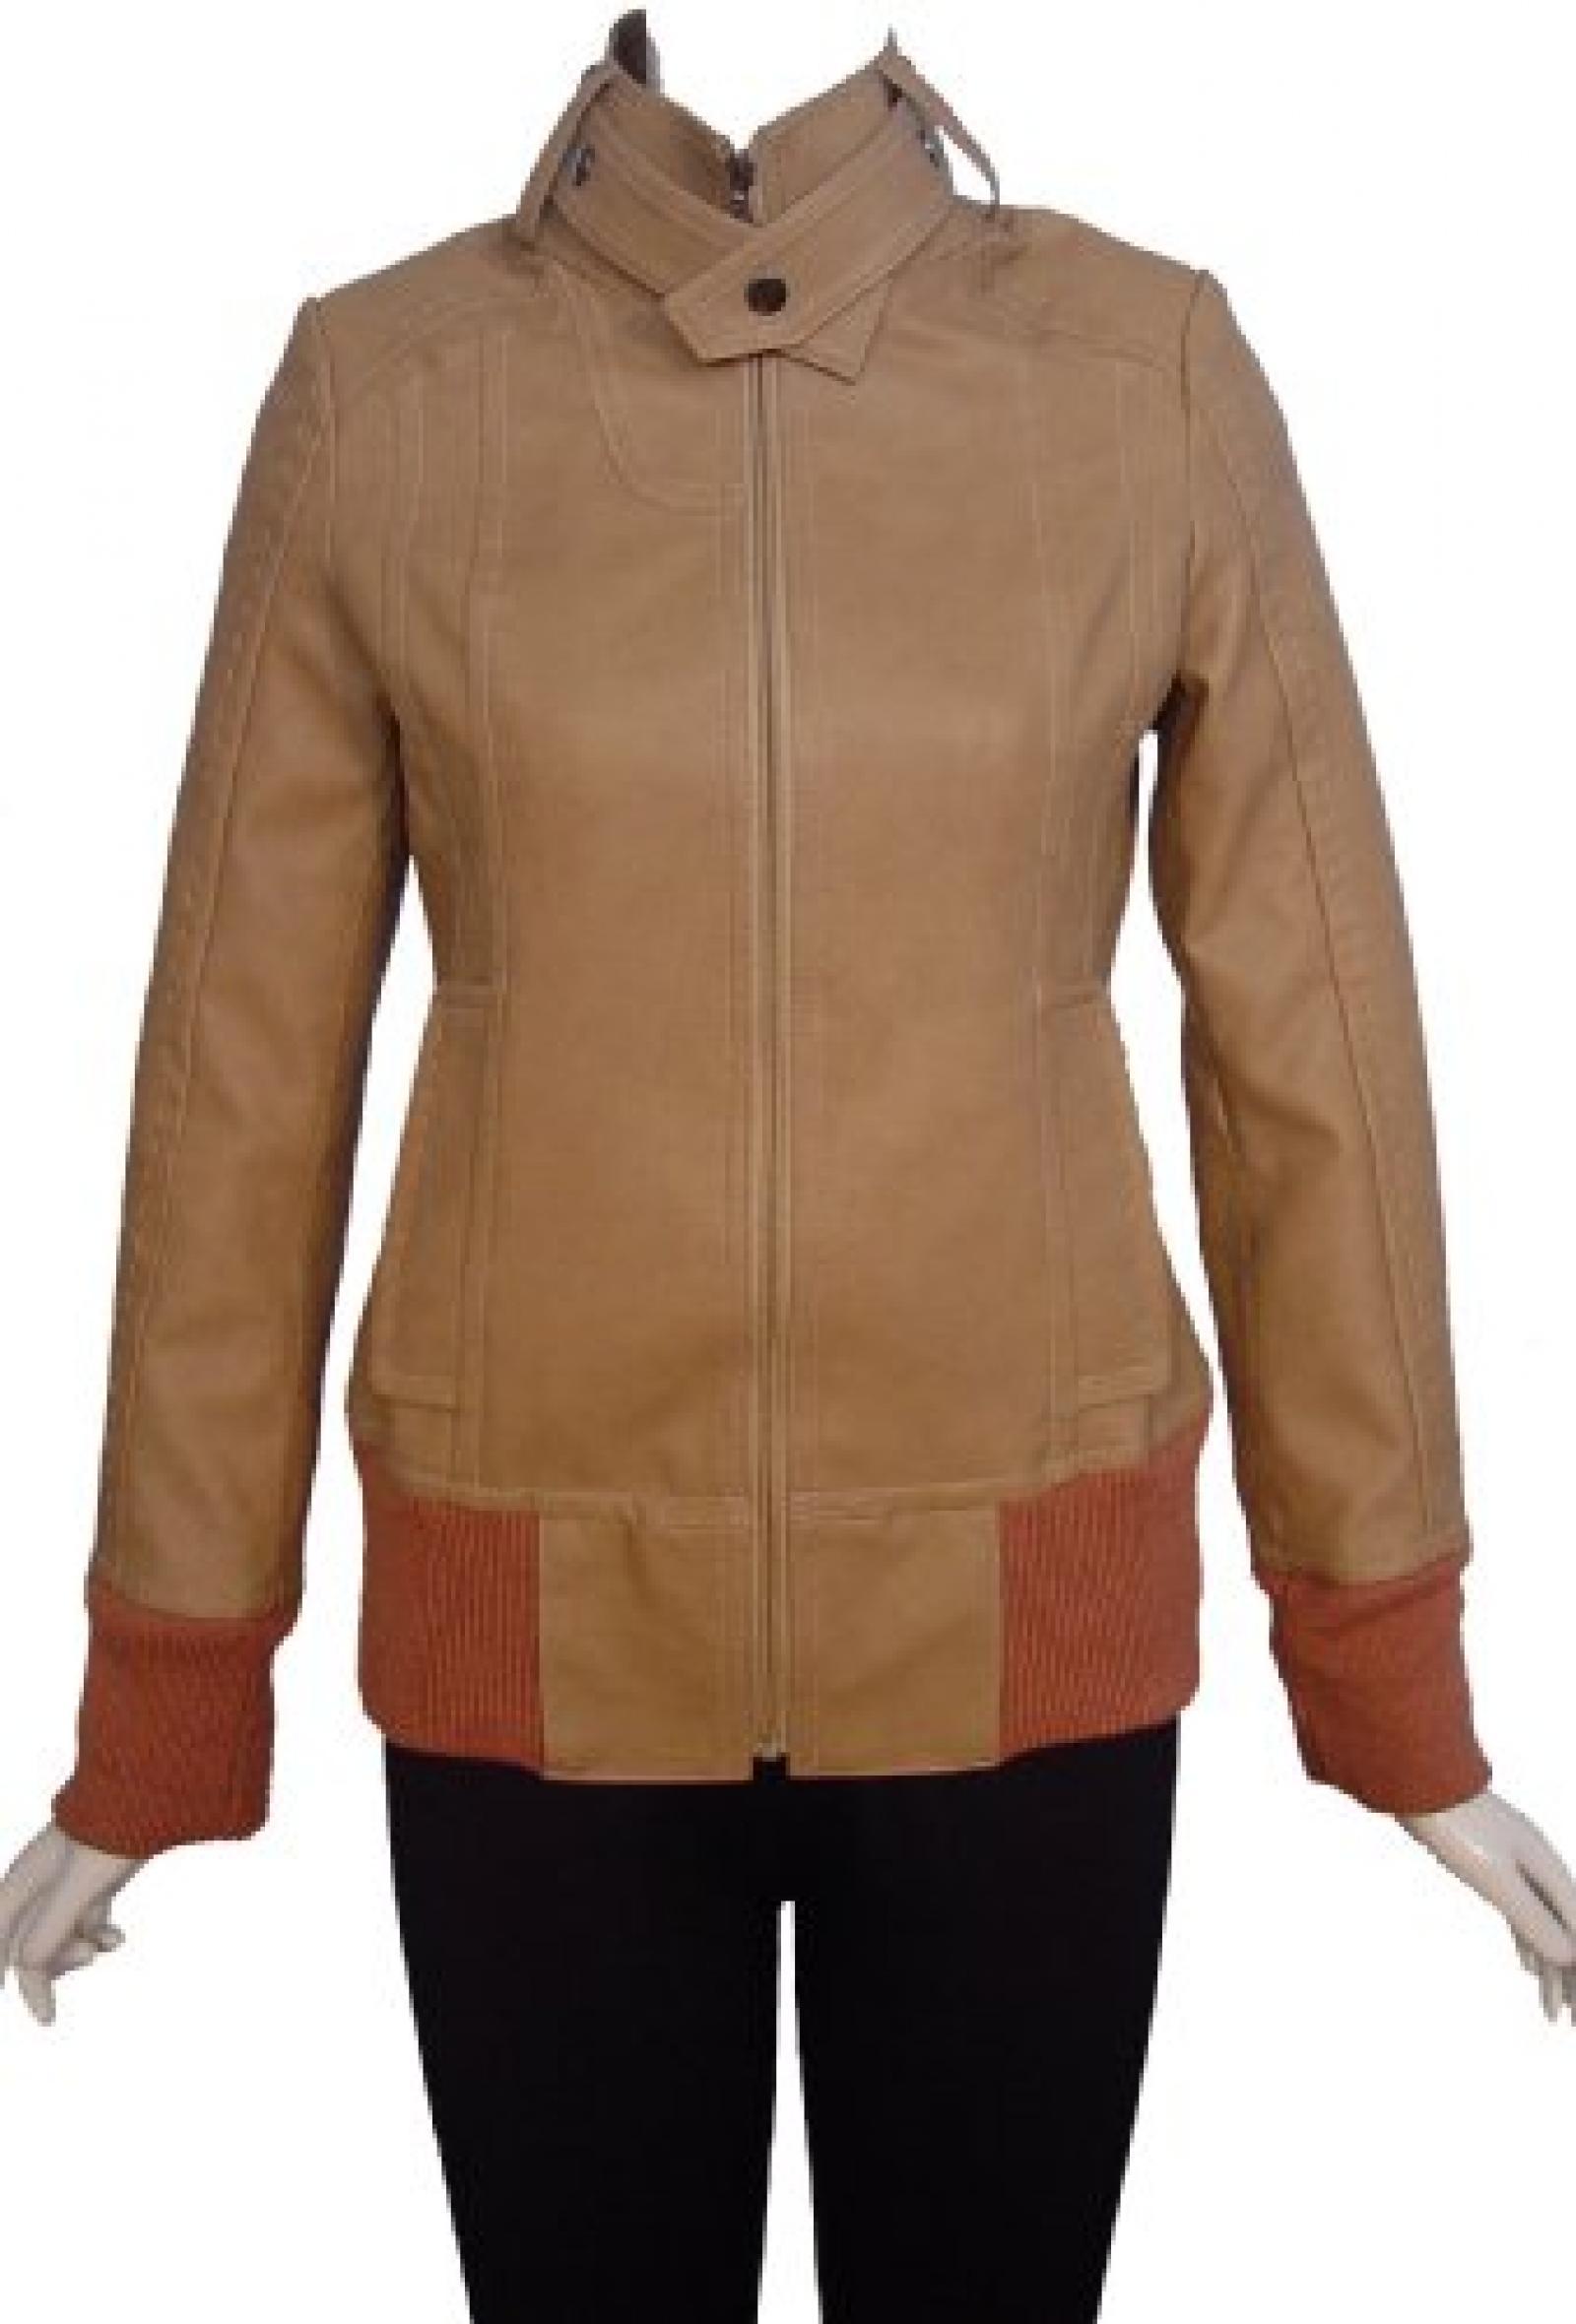 Nettailor Women PETITE SZ 4206 Soft Leather Casual Short Jacket Knit Cuff Bottom